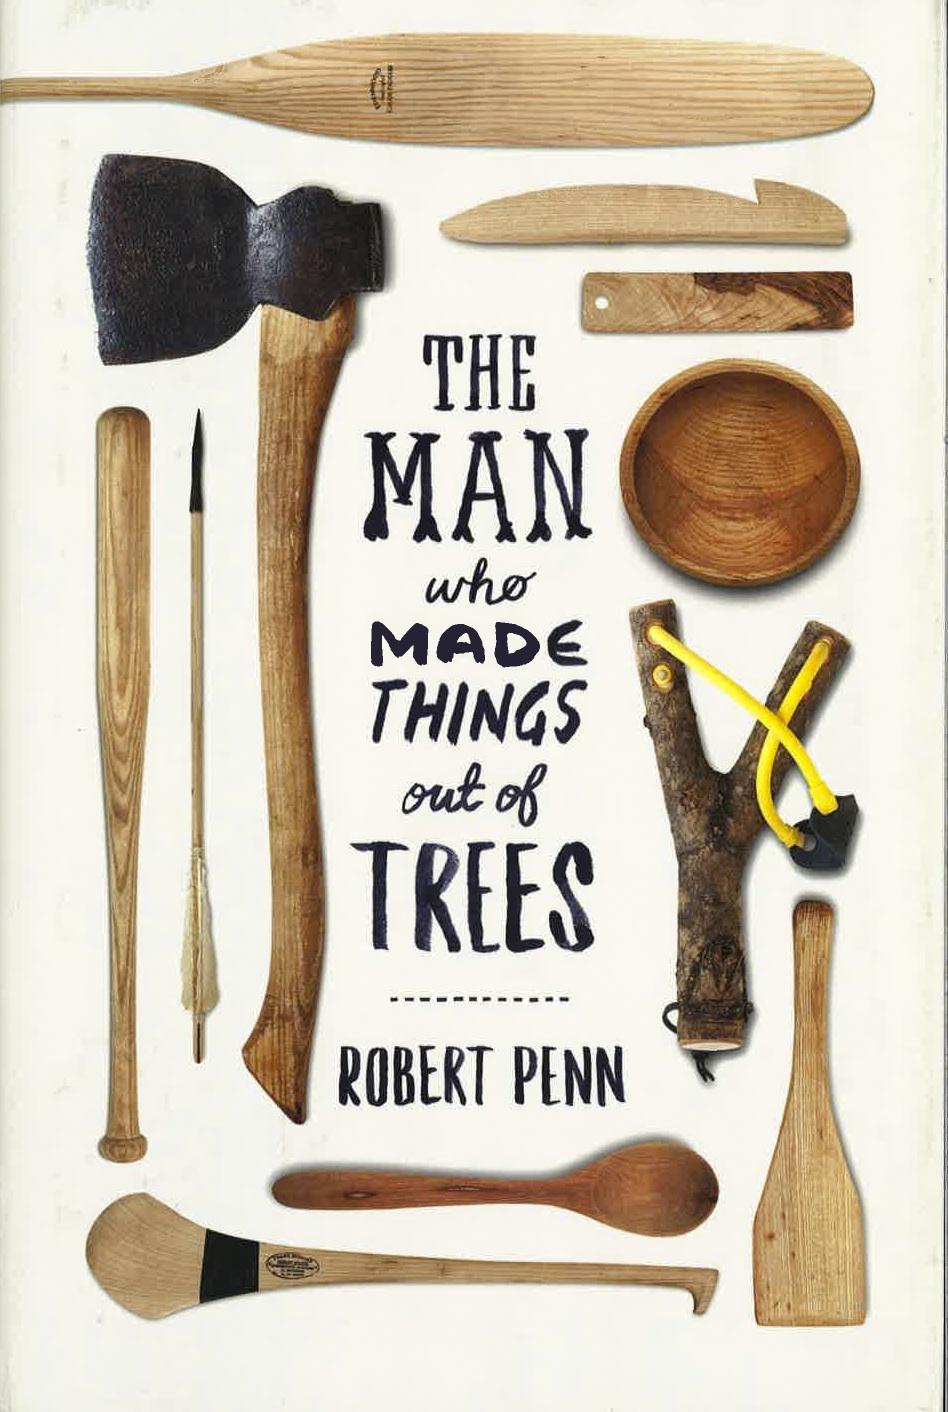 4 man who mae wood_001.jpg